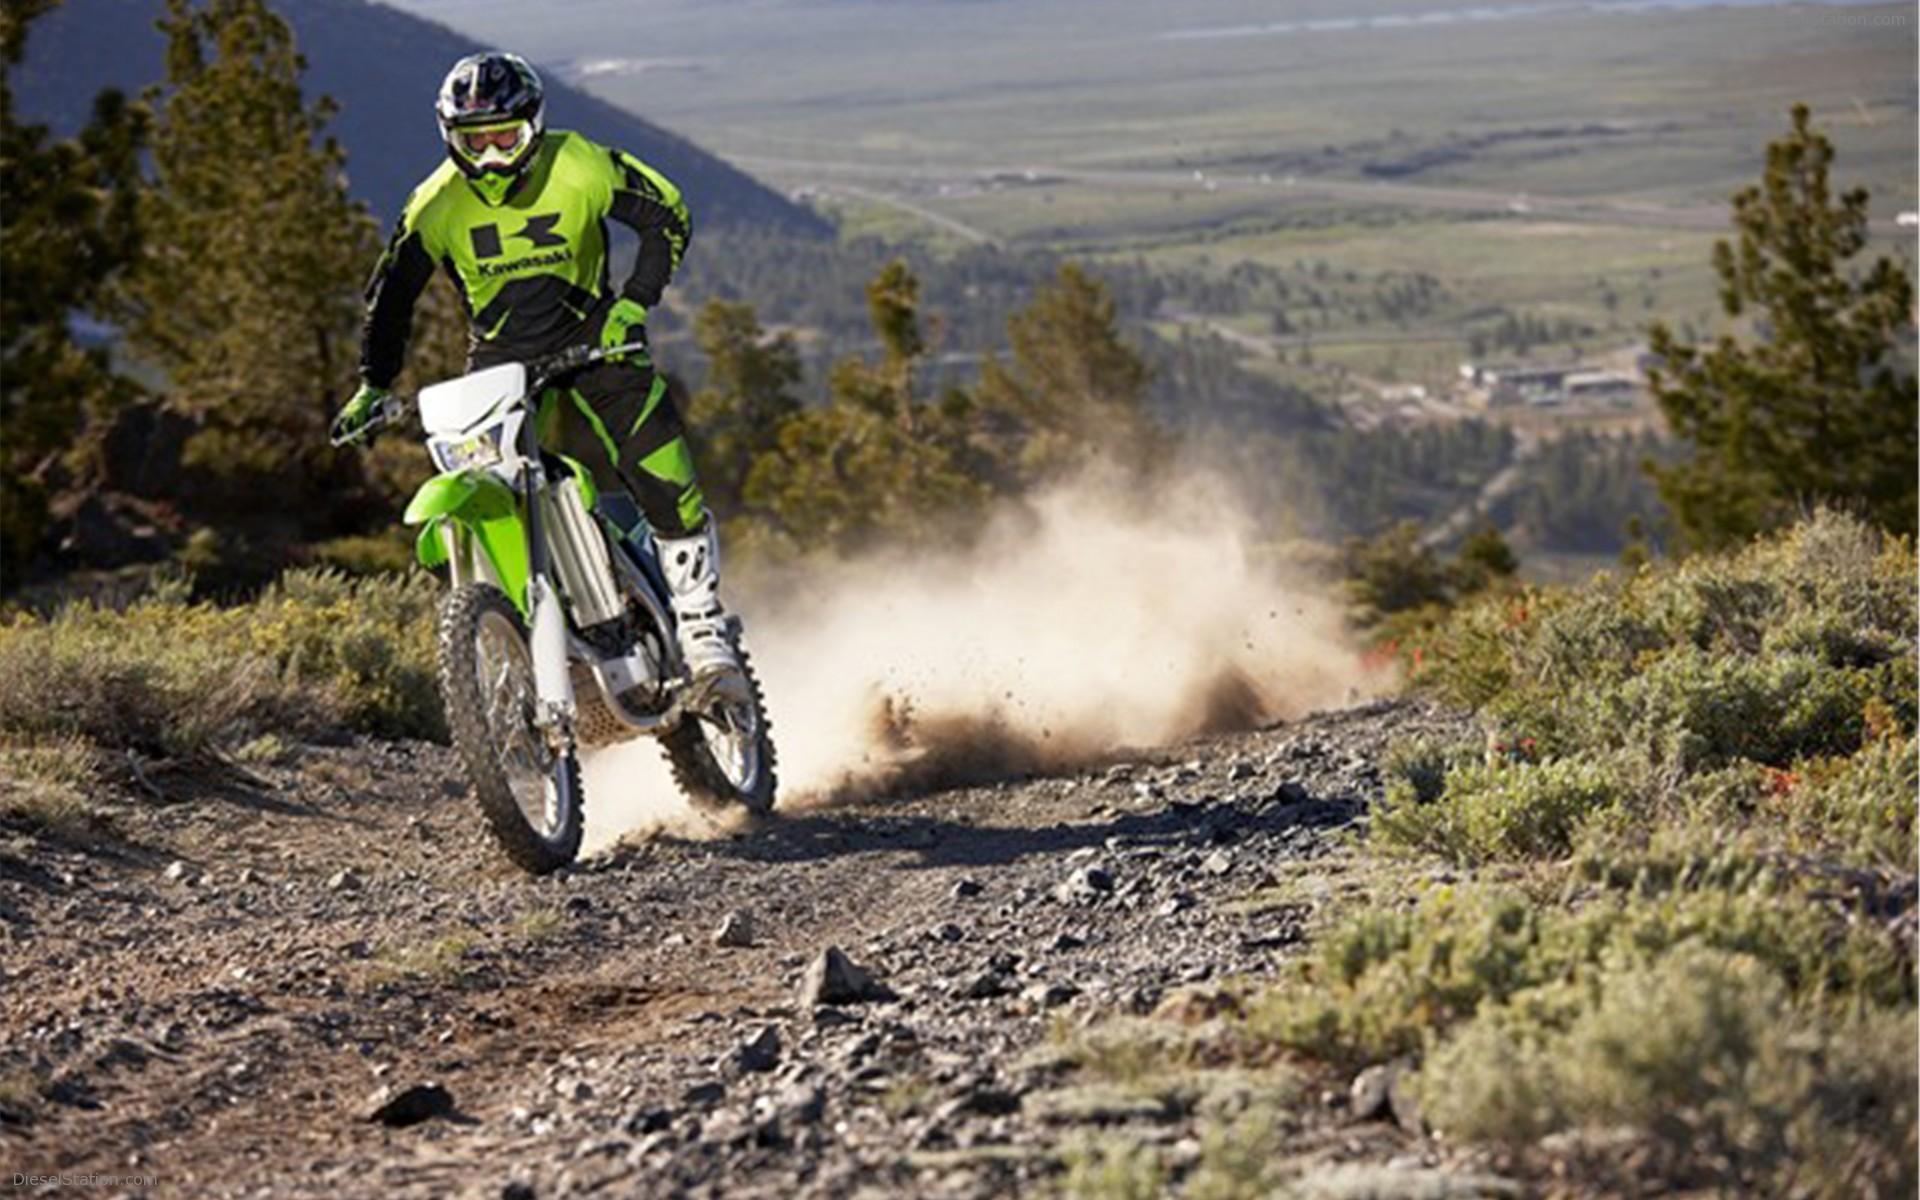 Test Drive A Motorcycle Kawasaki KLX 450 R Wallpapers And